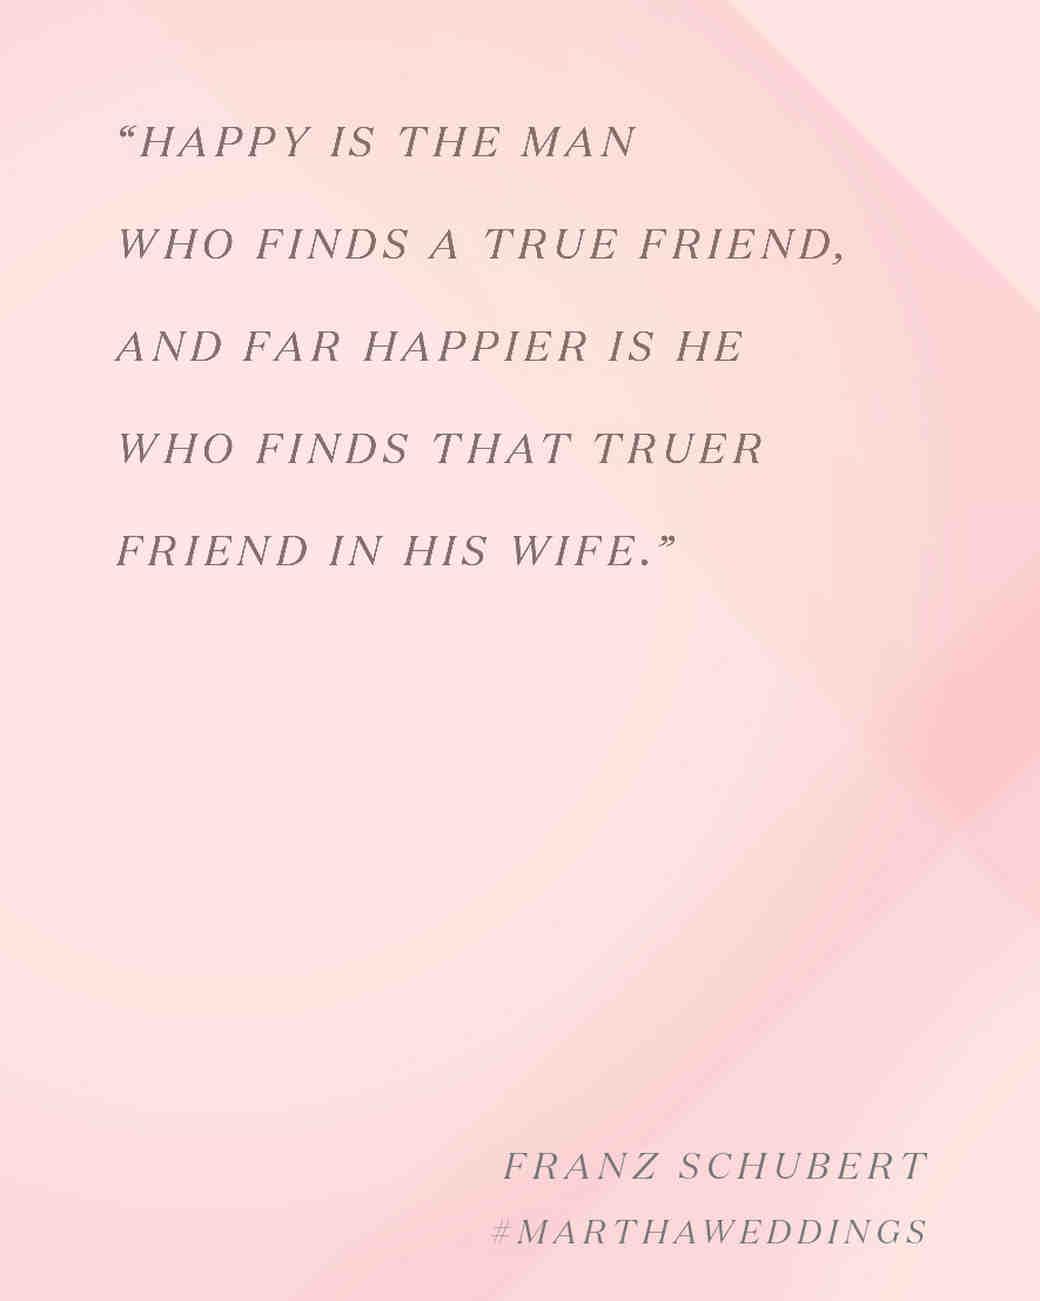 love-quotes-franz-schubert-1015.jpg